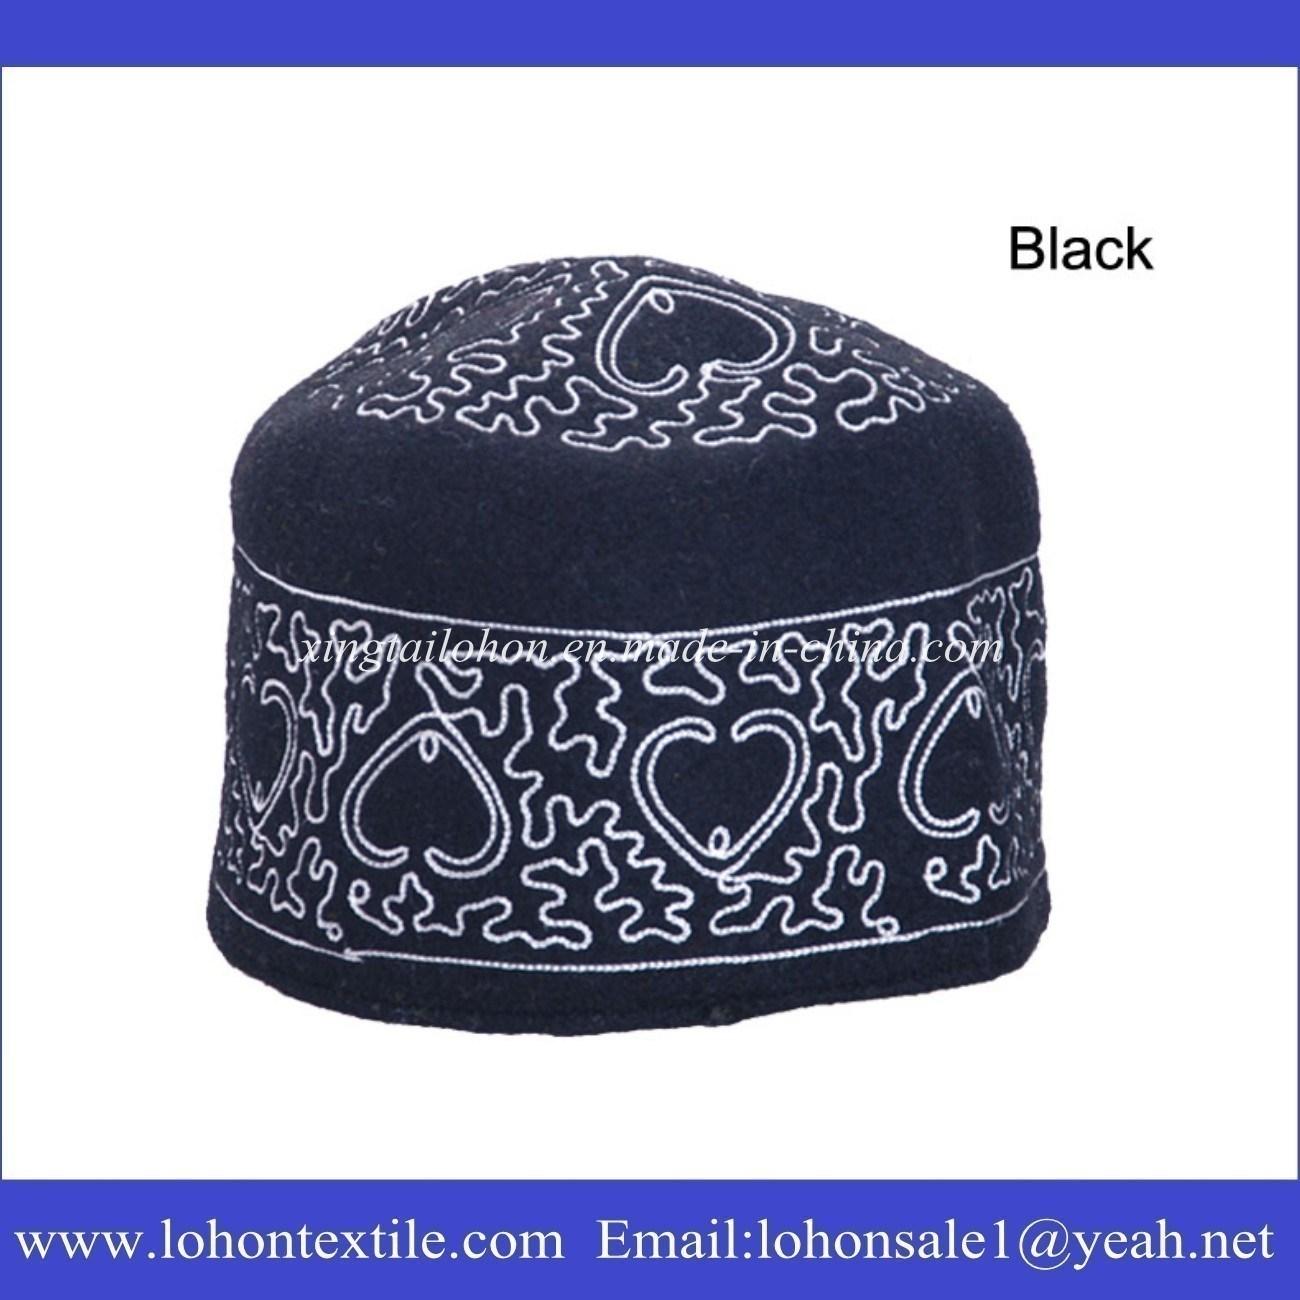 Wool Felt Muslim Prayer Hats, Muslim Prayer Cap, African Traditional Caps